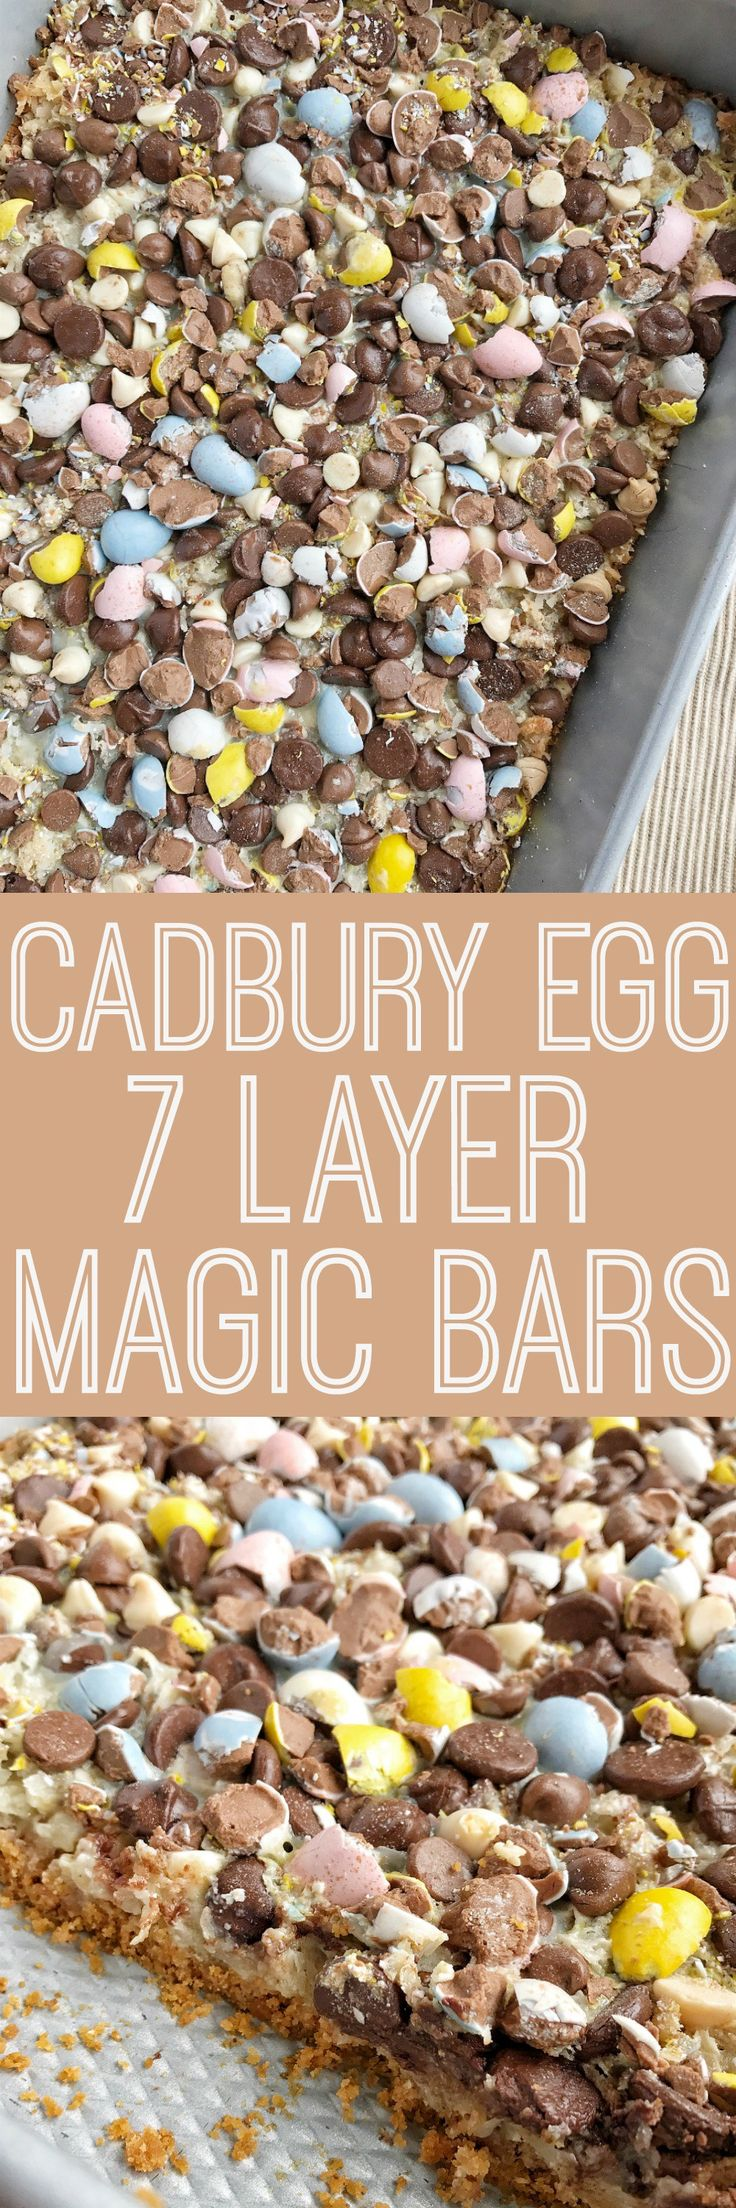 Cadbury Egg 7 Layer Magic Bars